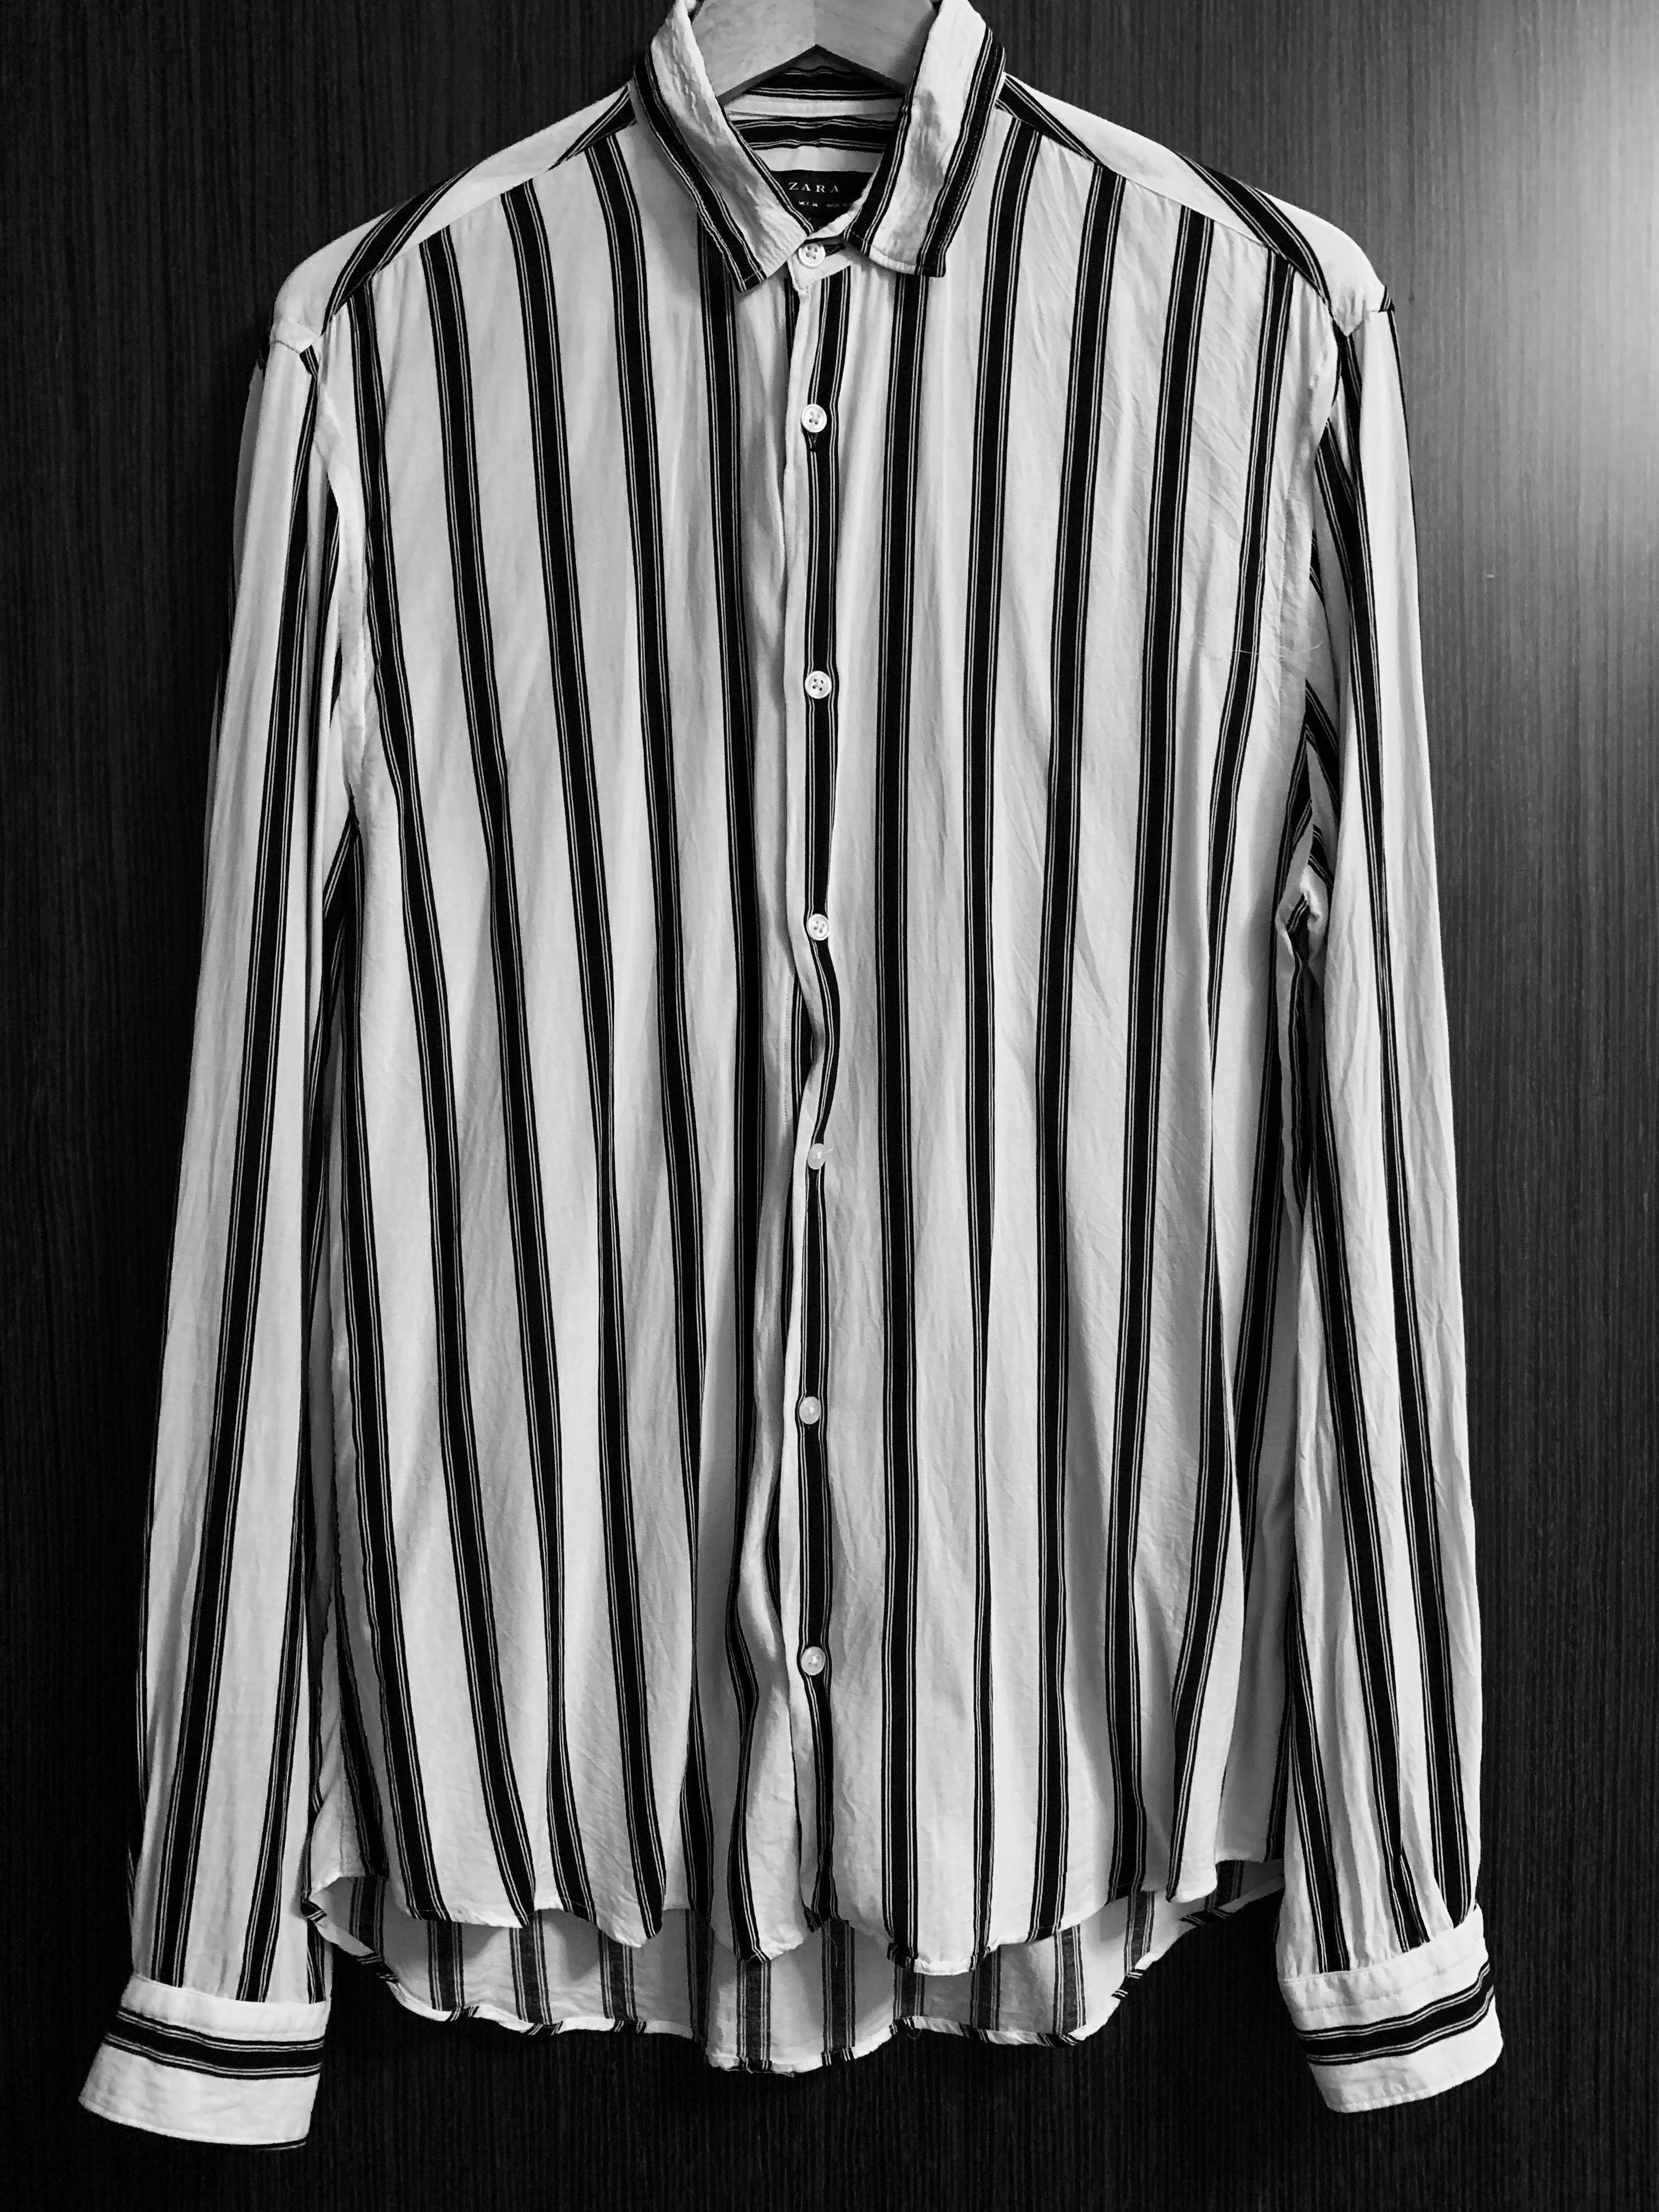 cf9f88d03229b4 (PRELOVED) ZARA FLOWY STRIPED SHIRT, Men's Fashion, Clothes, Tops on  Carousell